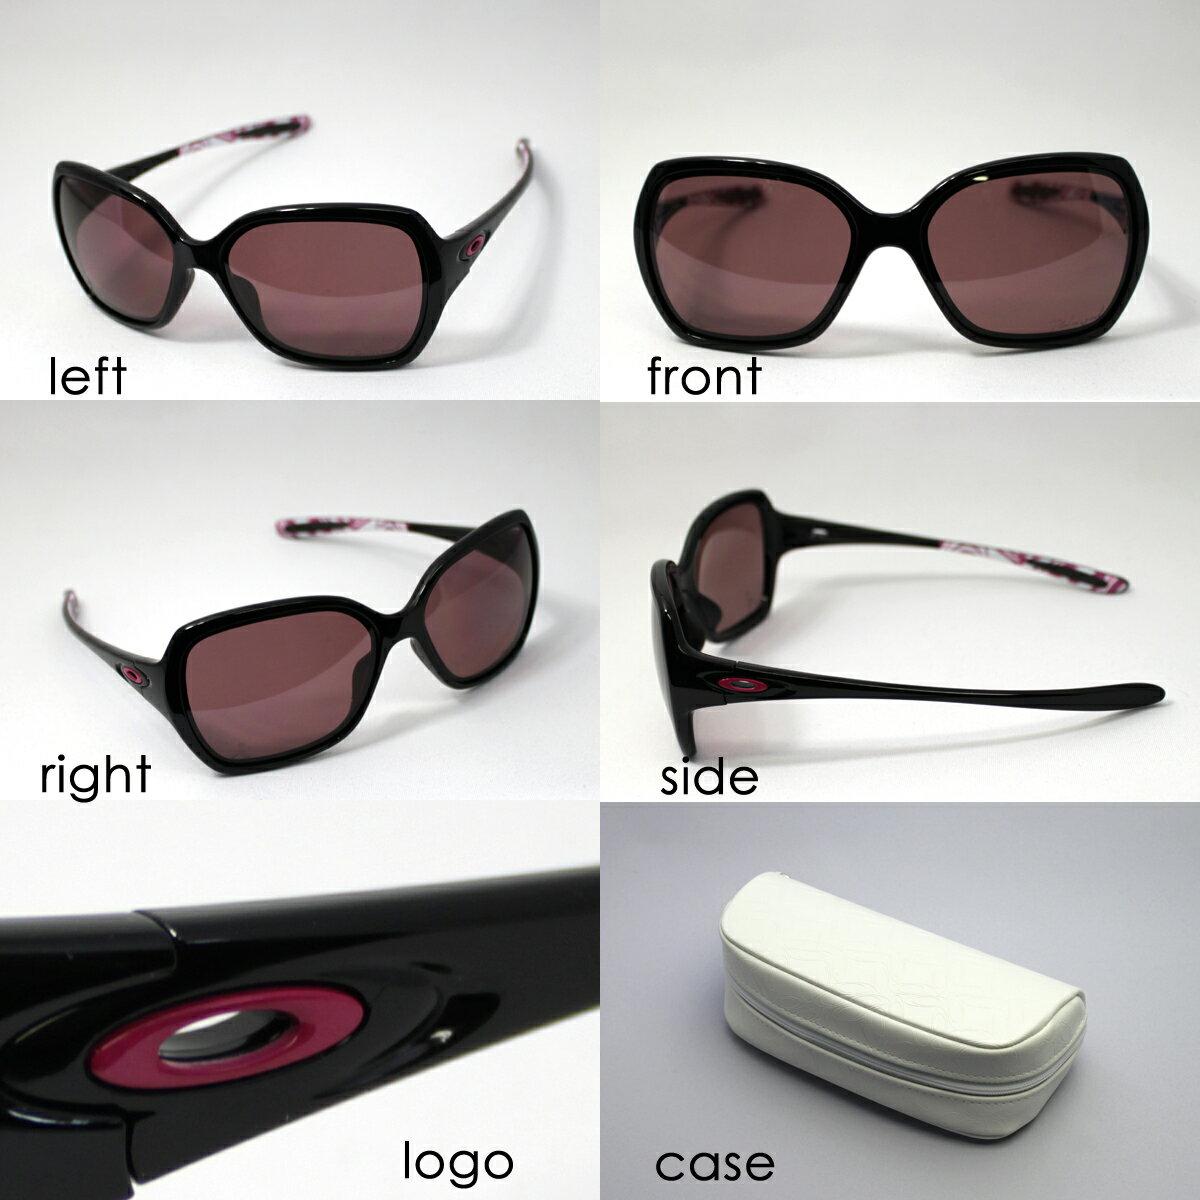 c2f5b0ea97 Oakley Polarized Overtime Breast Cancer Awareness Edition Sunglasses ...